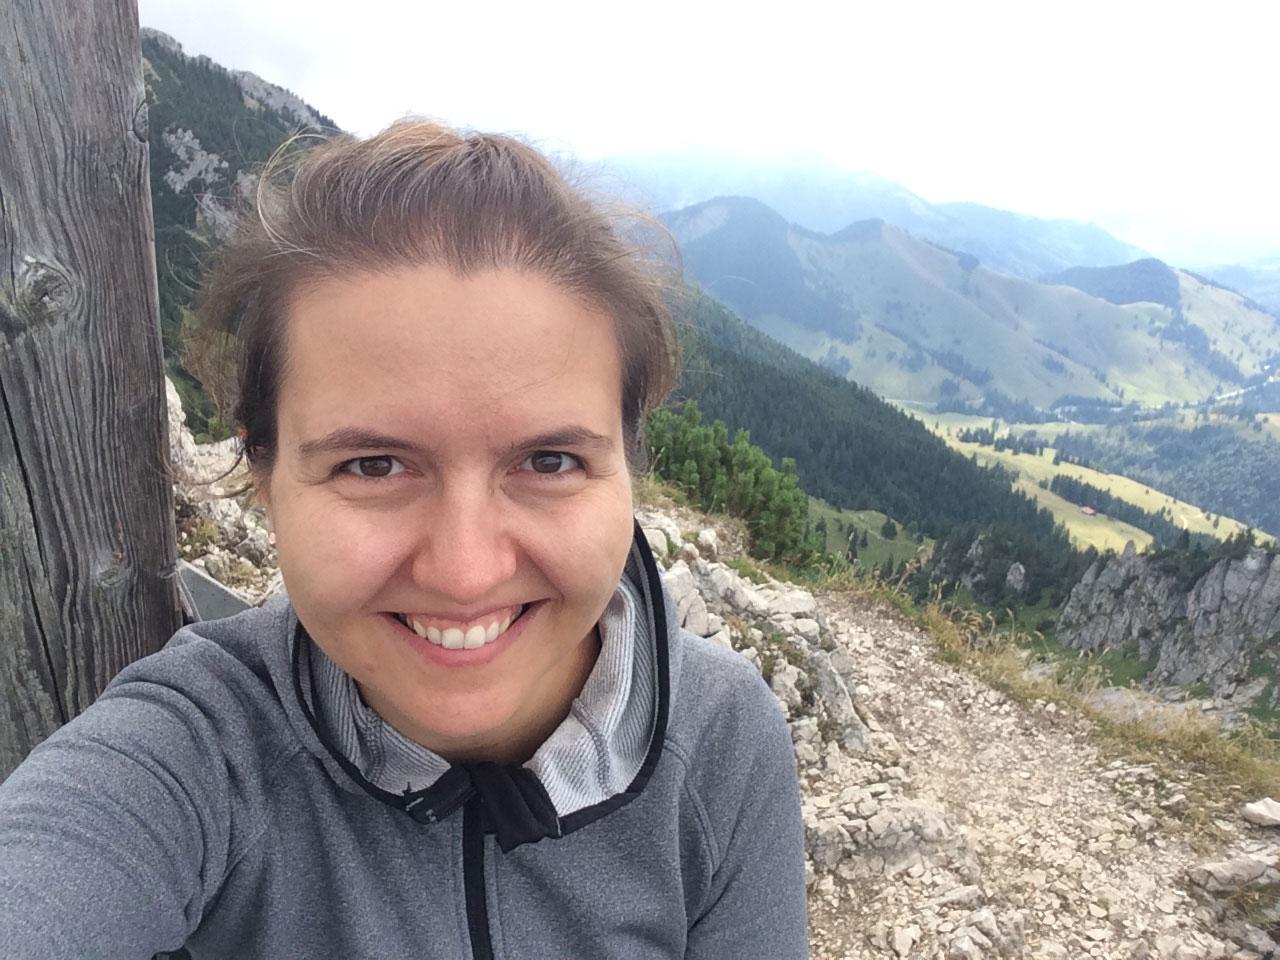 Bea-froehlich-Lacherspitze-gipfel-wandertour